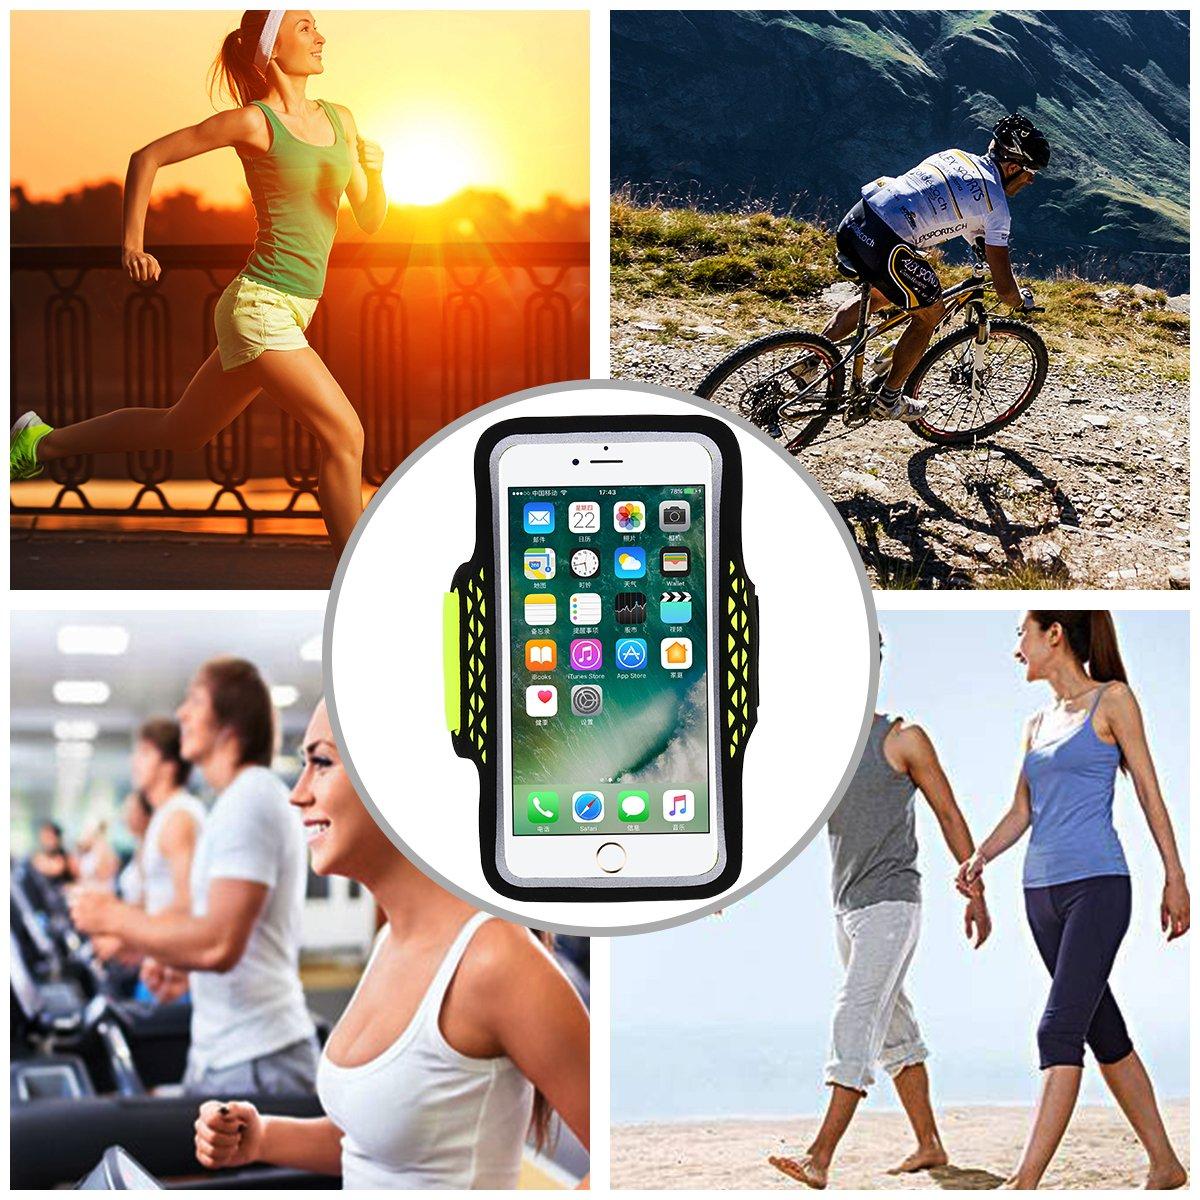 400fc31a8e3 Haissky deporte running Armband Accesorios de móviles y telefonía a prueba  de sudor brazalete para iPhone 7 Plus 6 ...